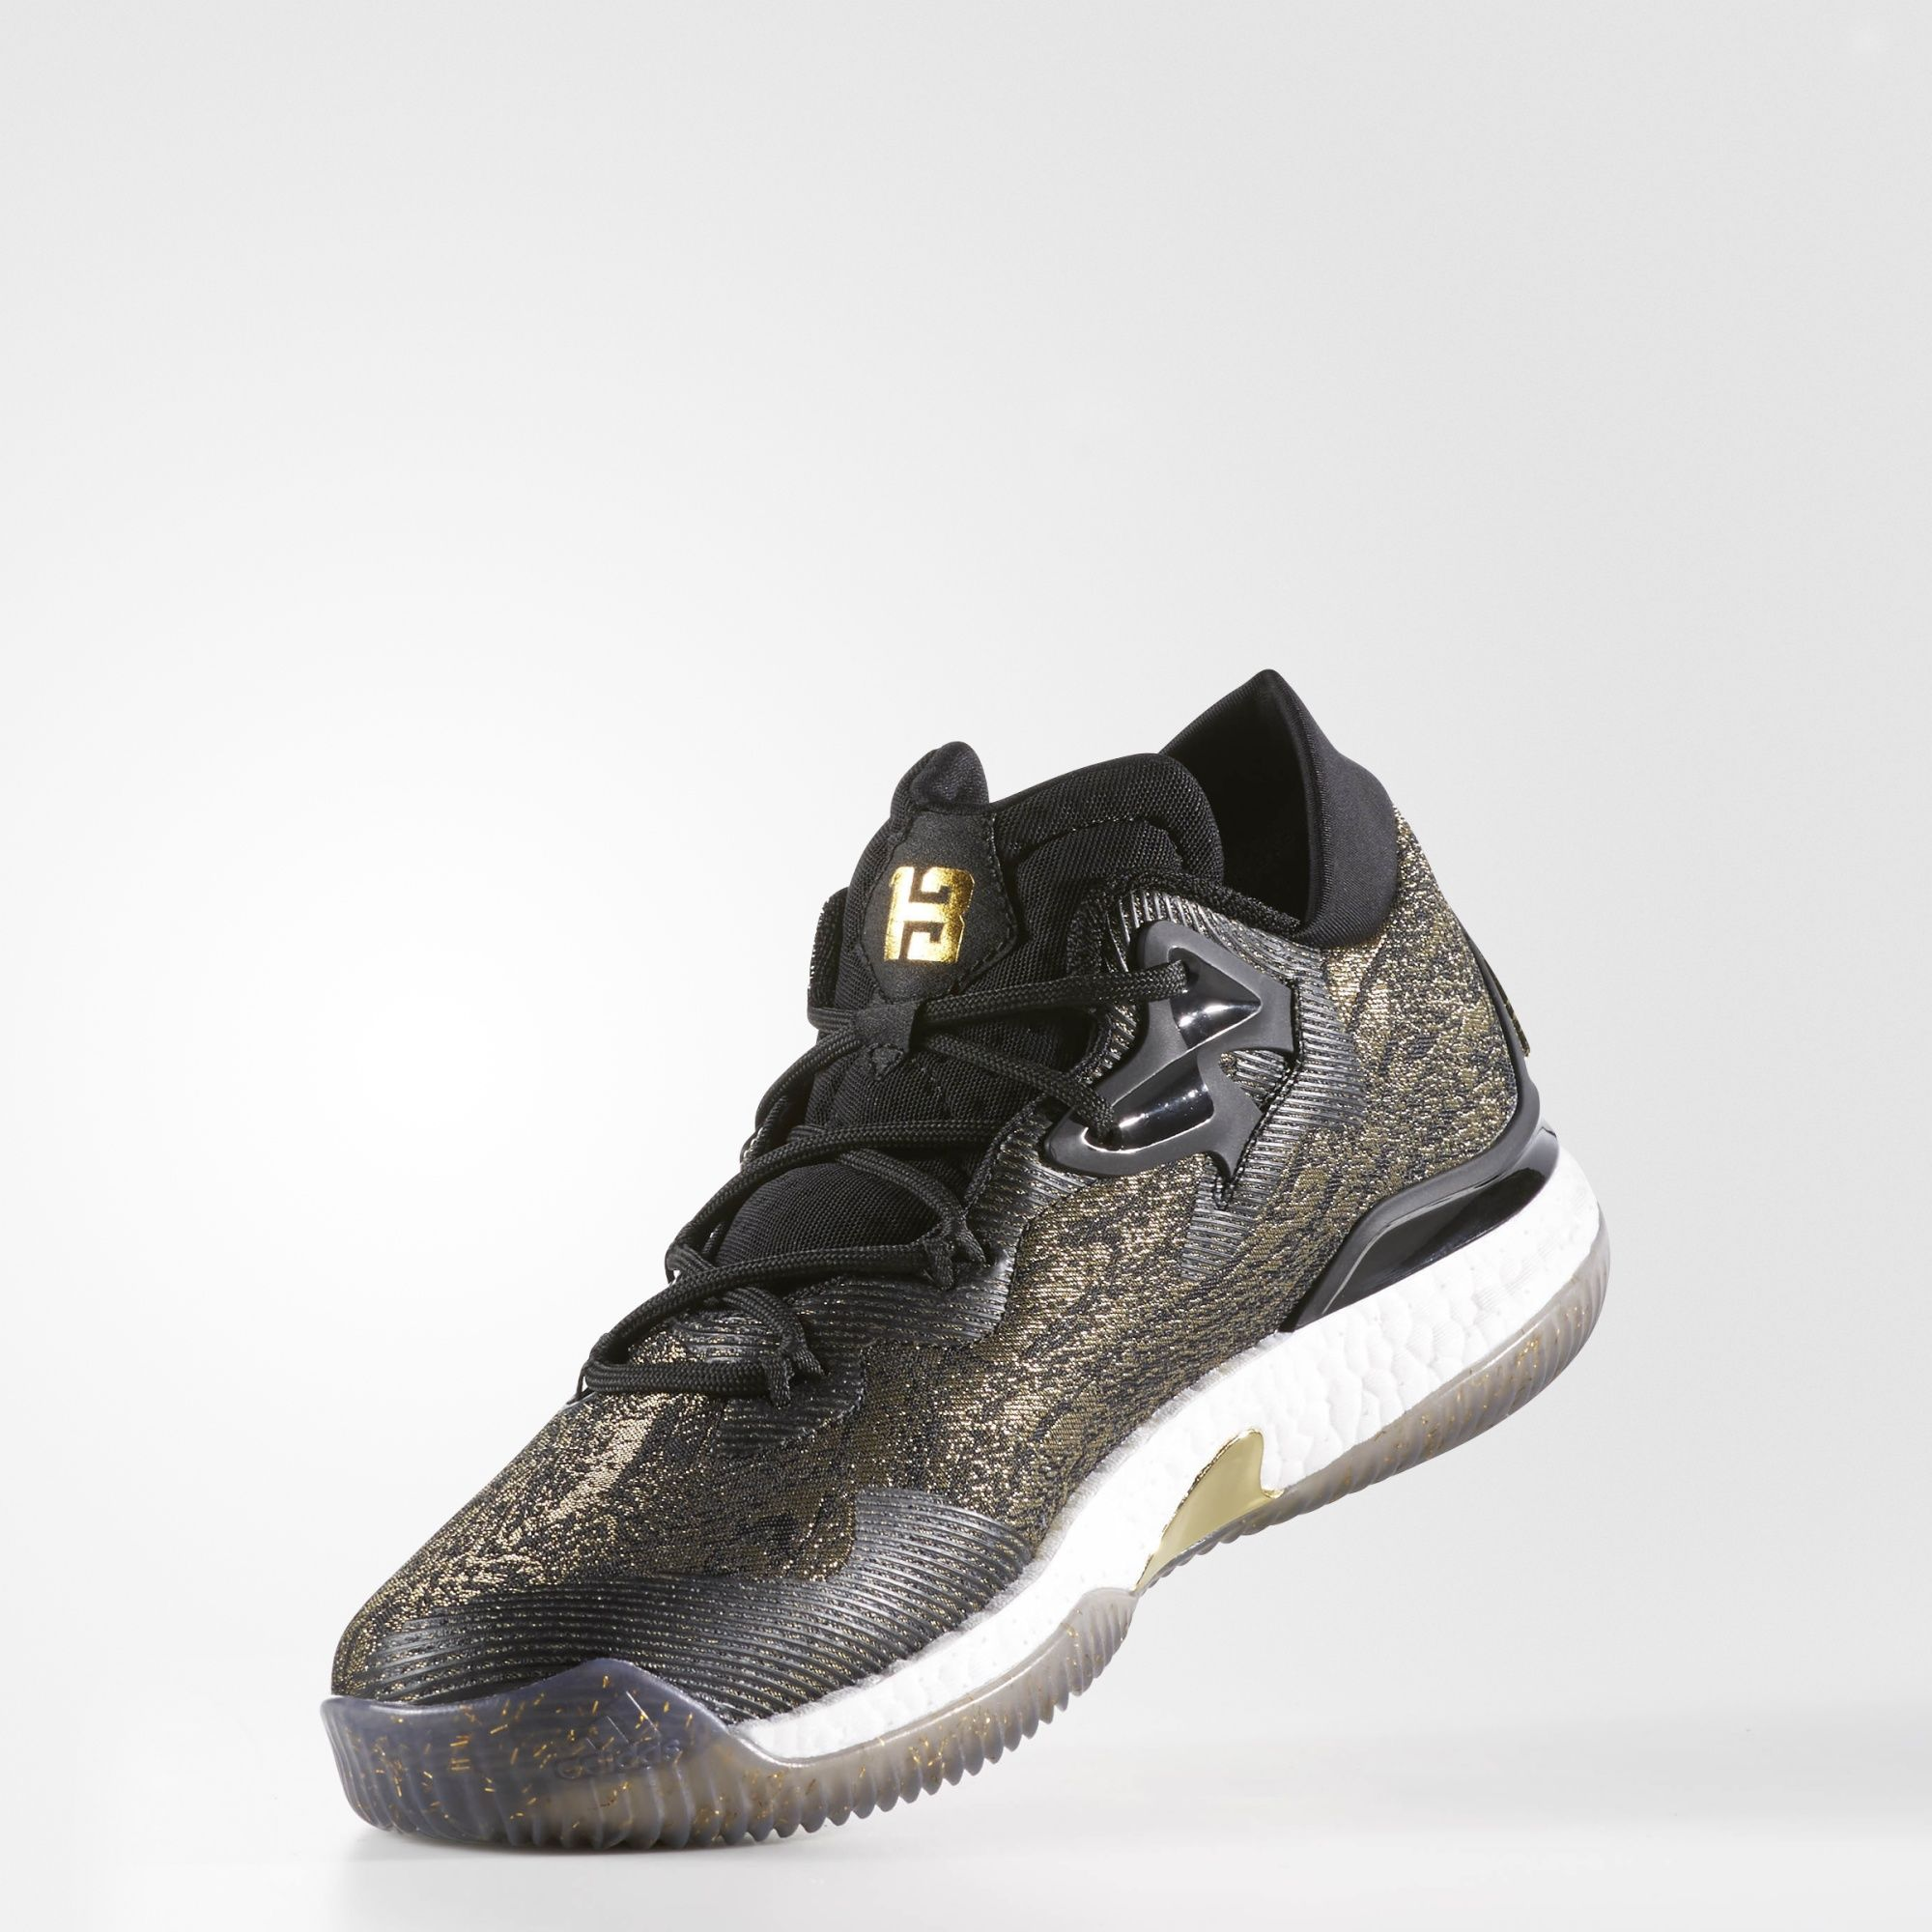 best website f0102 fbb7a Adidas Crazylight Boost 2016 - Black-Gold-Angle. Jul8